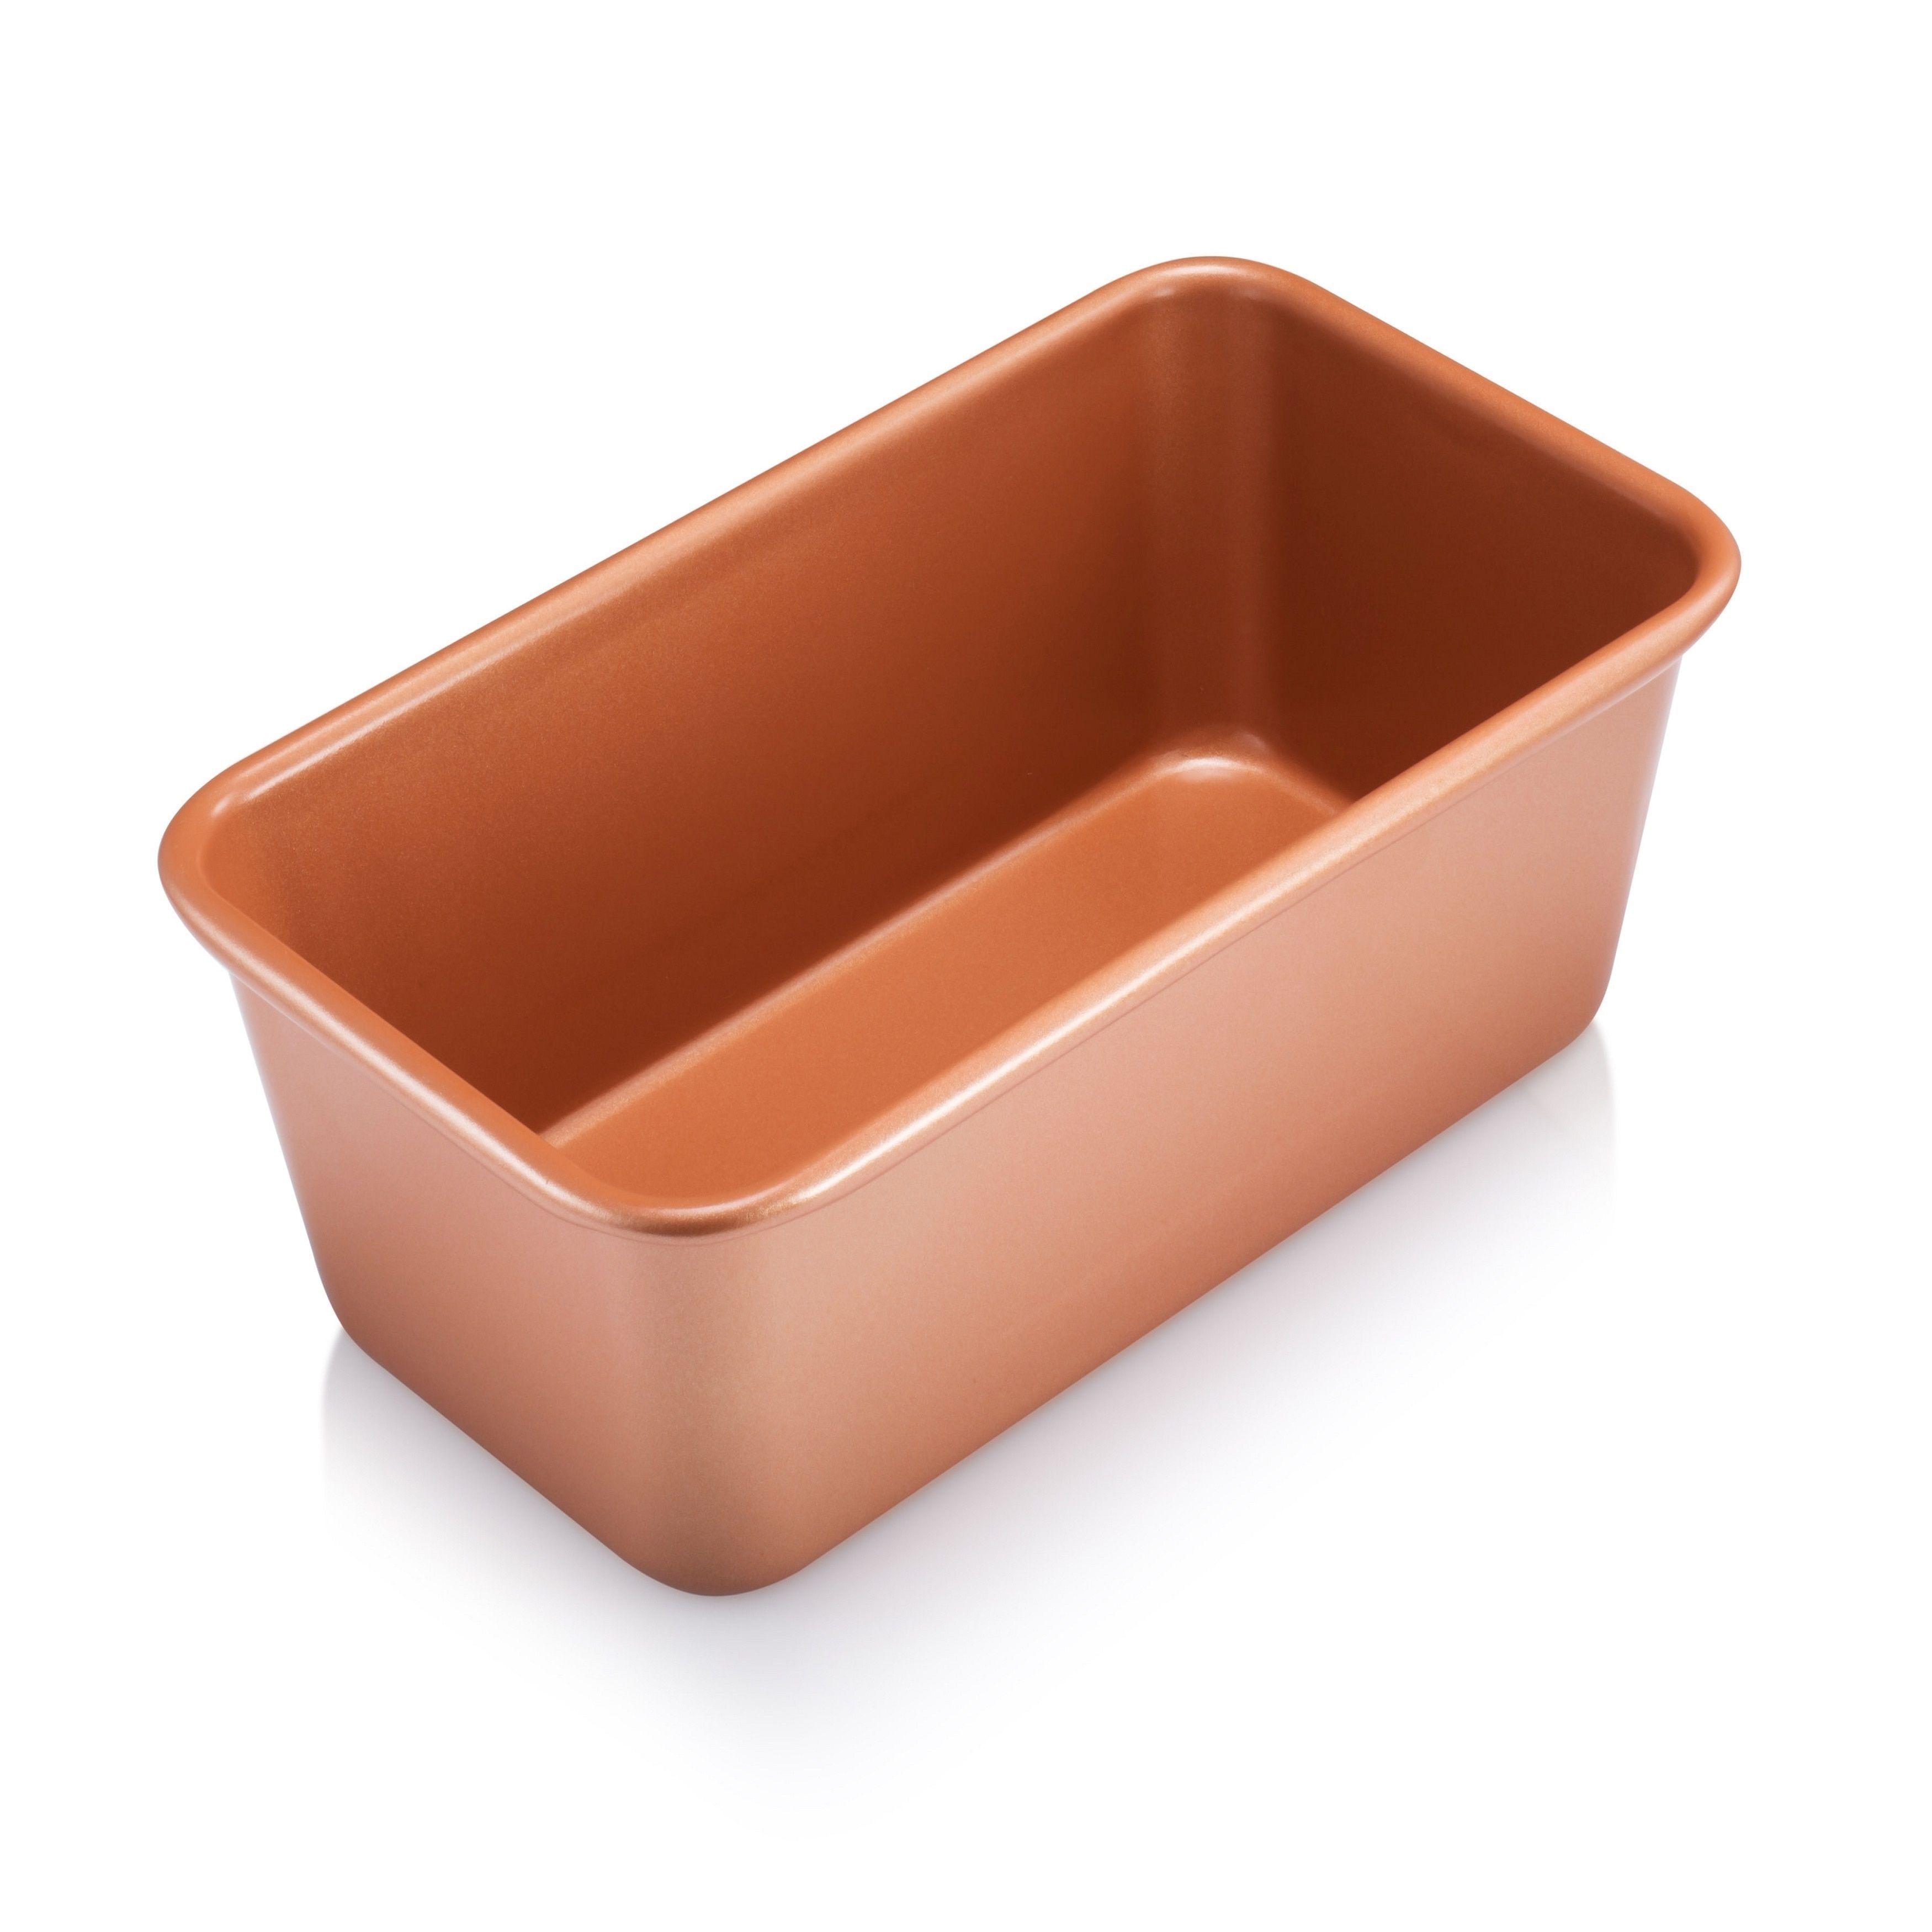 Gotham Steel Loaf Baking Pan Non Stick Ti Ceramic Copper Loaf